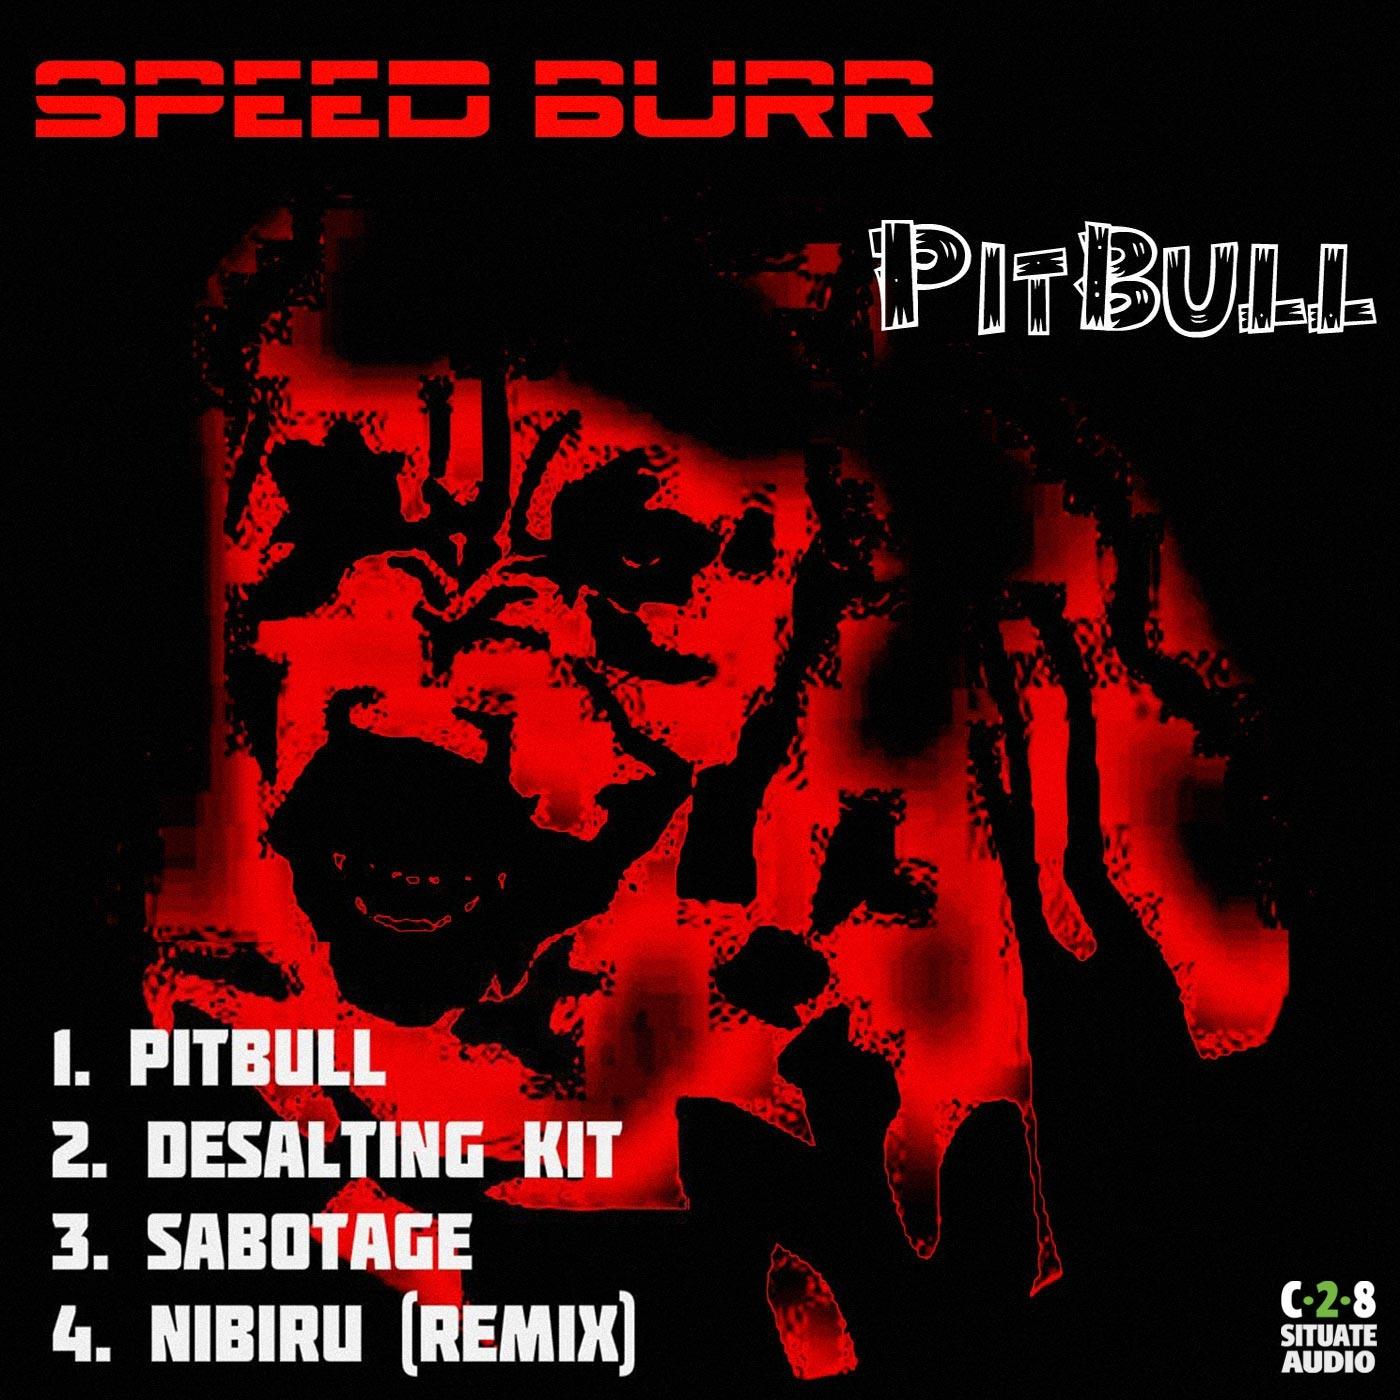 Speed Burr - Pitbull (Original Mix)